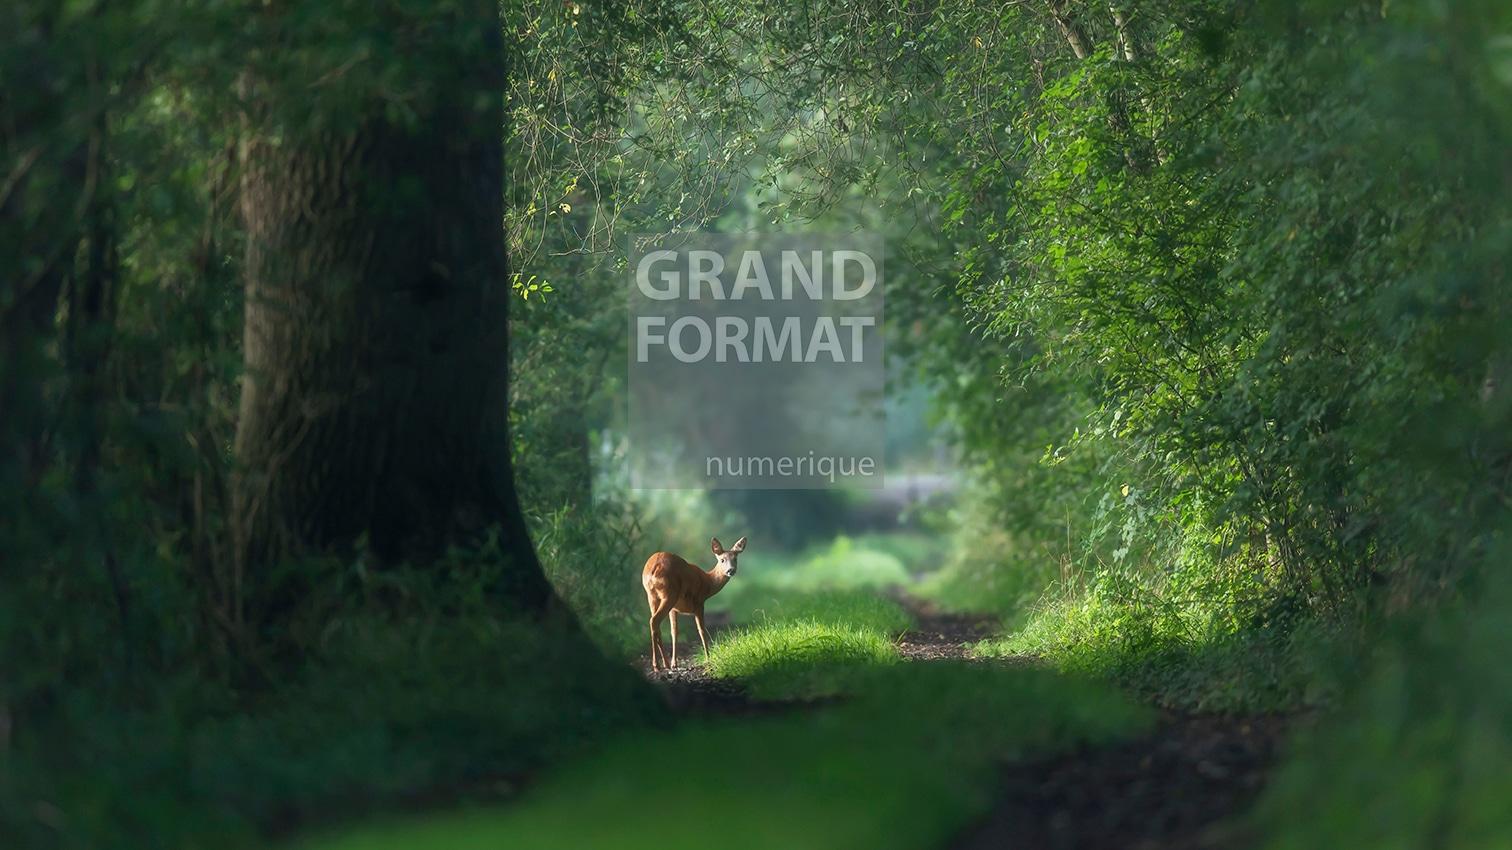 Forêt cerf photo impression et toile